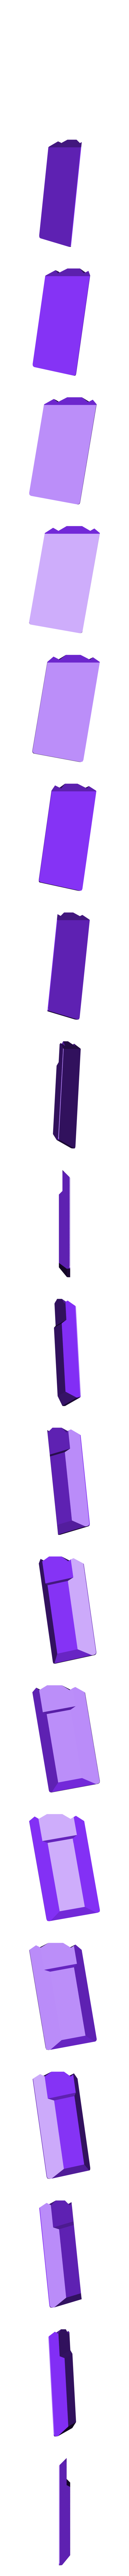 Plaet_Blank.stl Download STL file 3DTAC / VERTX 80° Tactical Grip • 3D printing template, 3DMX